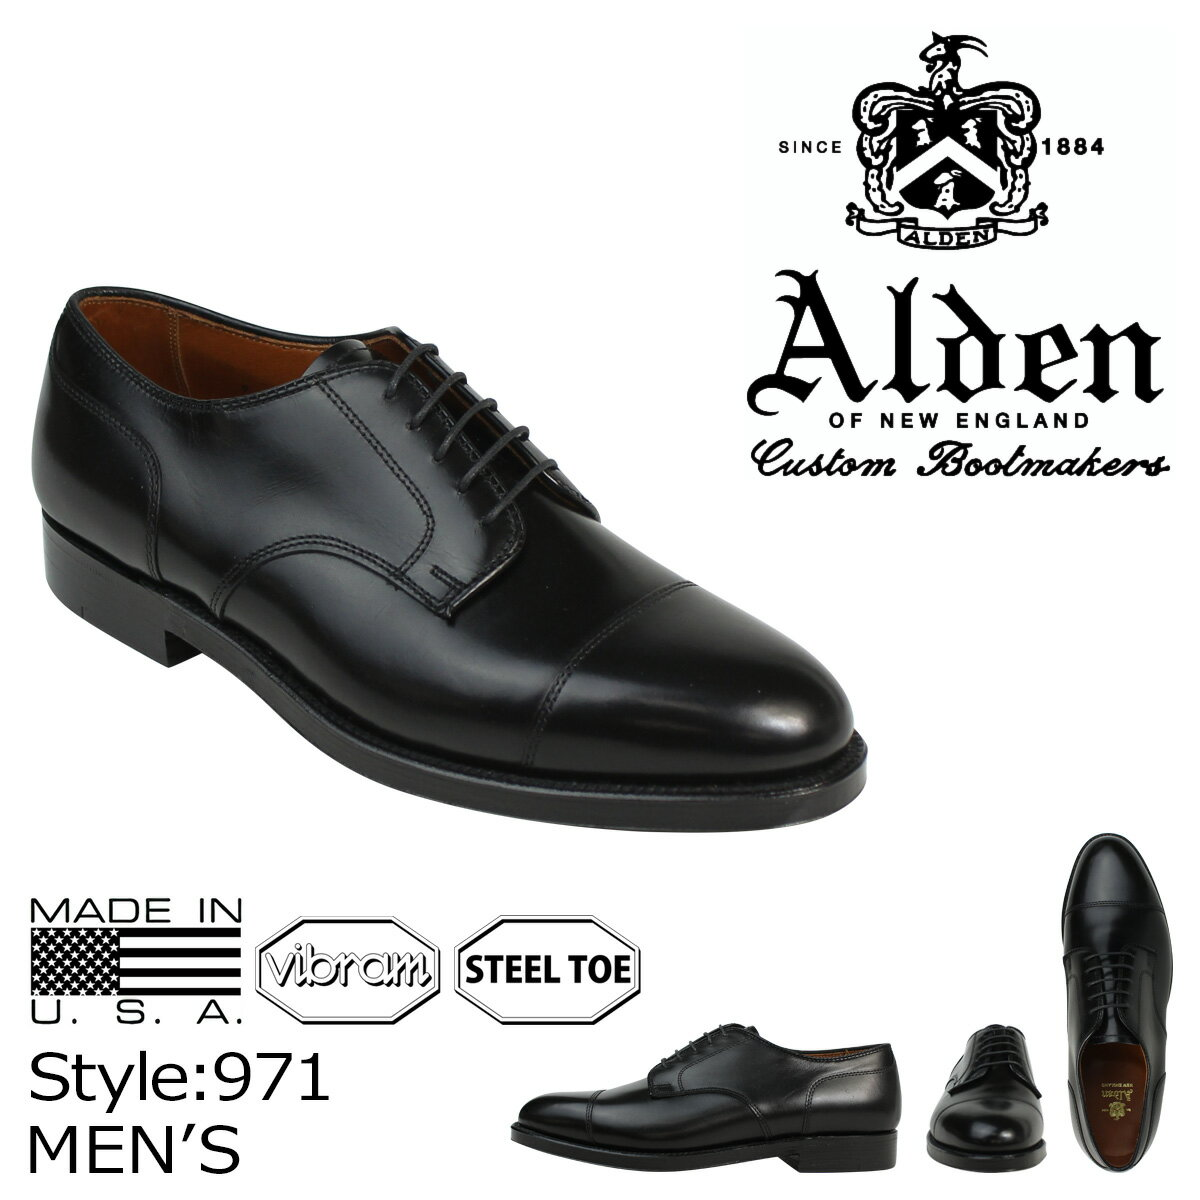 ALDEN オールデン シューズ メンズ STRAIGHT TIP BLUCHER Dワイズ 971